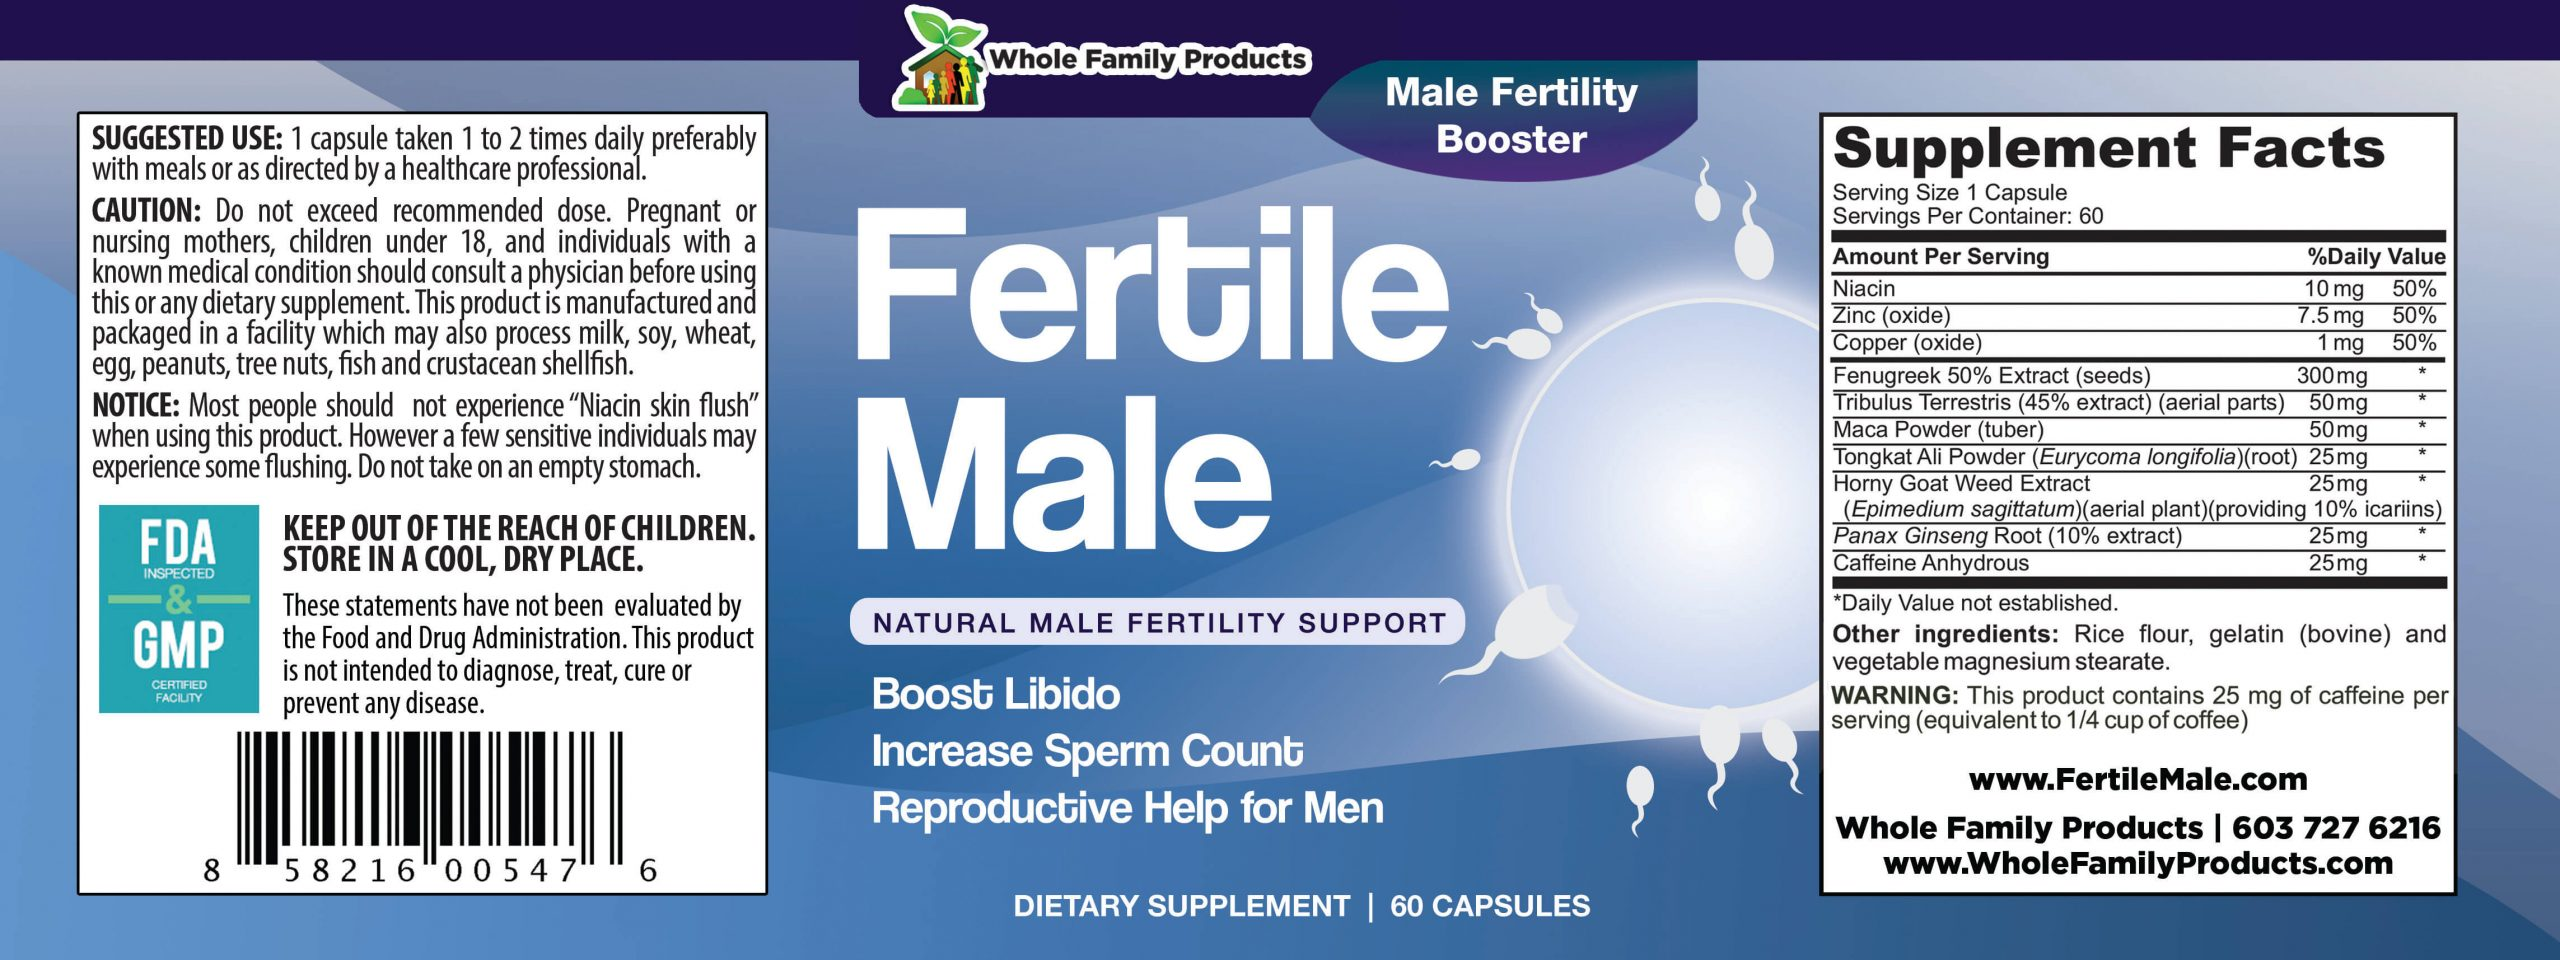 Fertile Male 60 Capsules Product Label